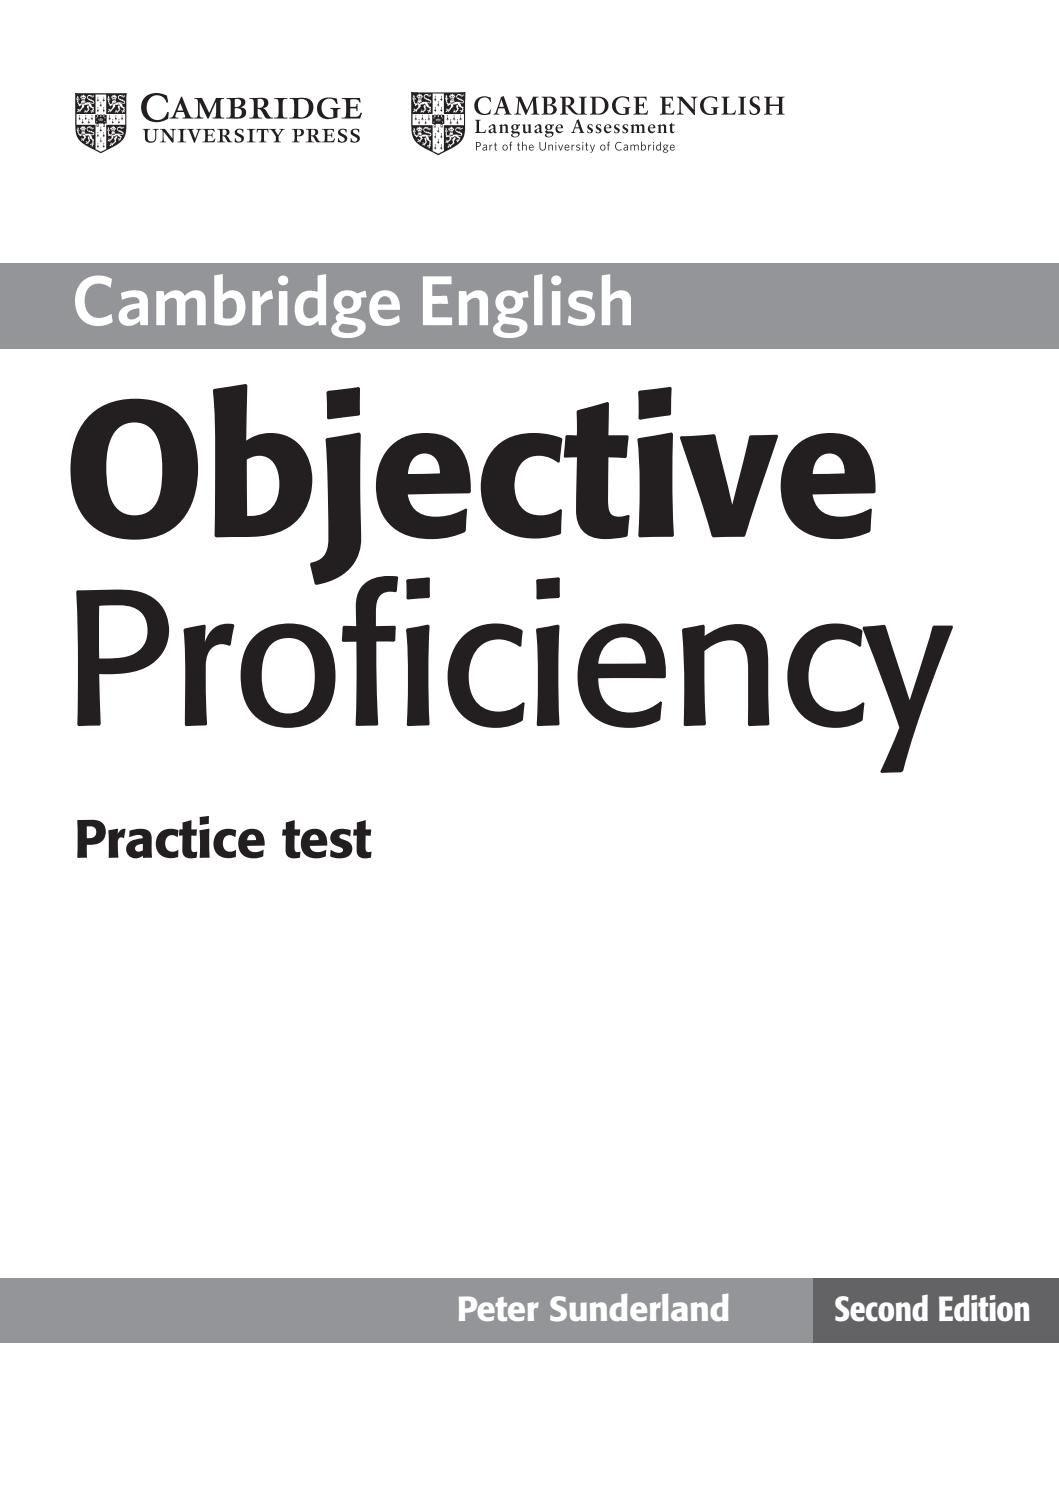 Objective proficiency practice test | English Proficiency Exams